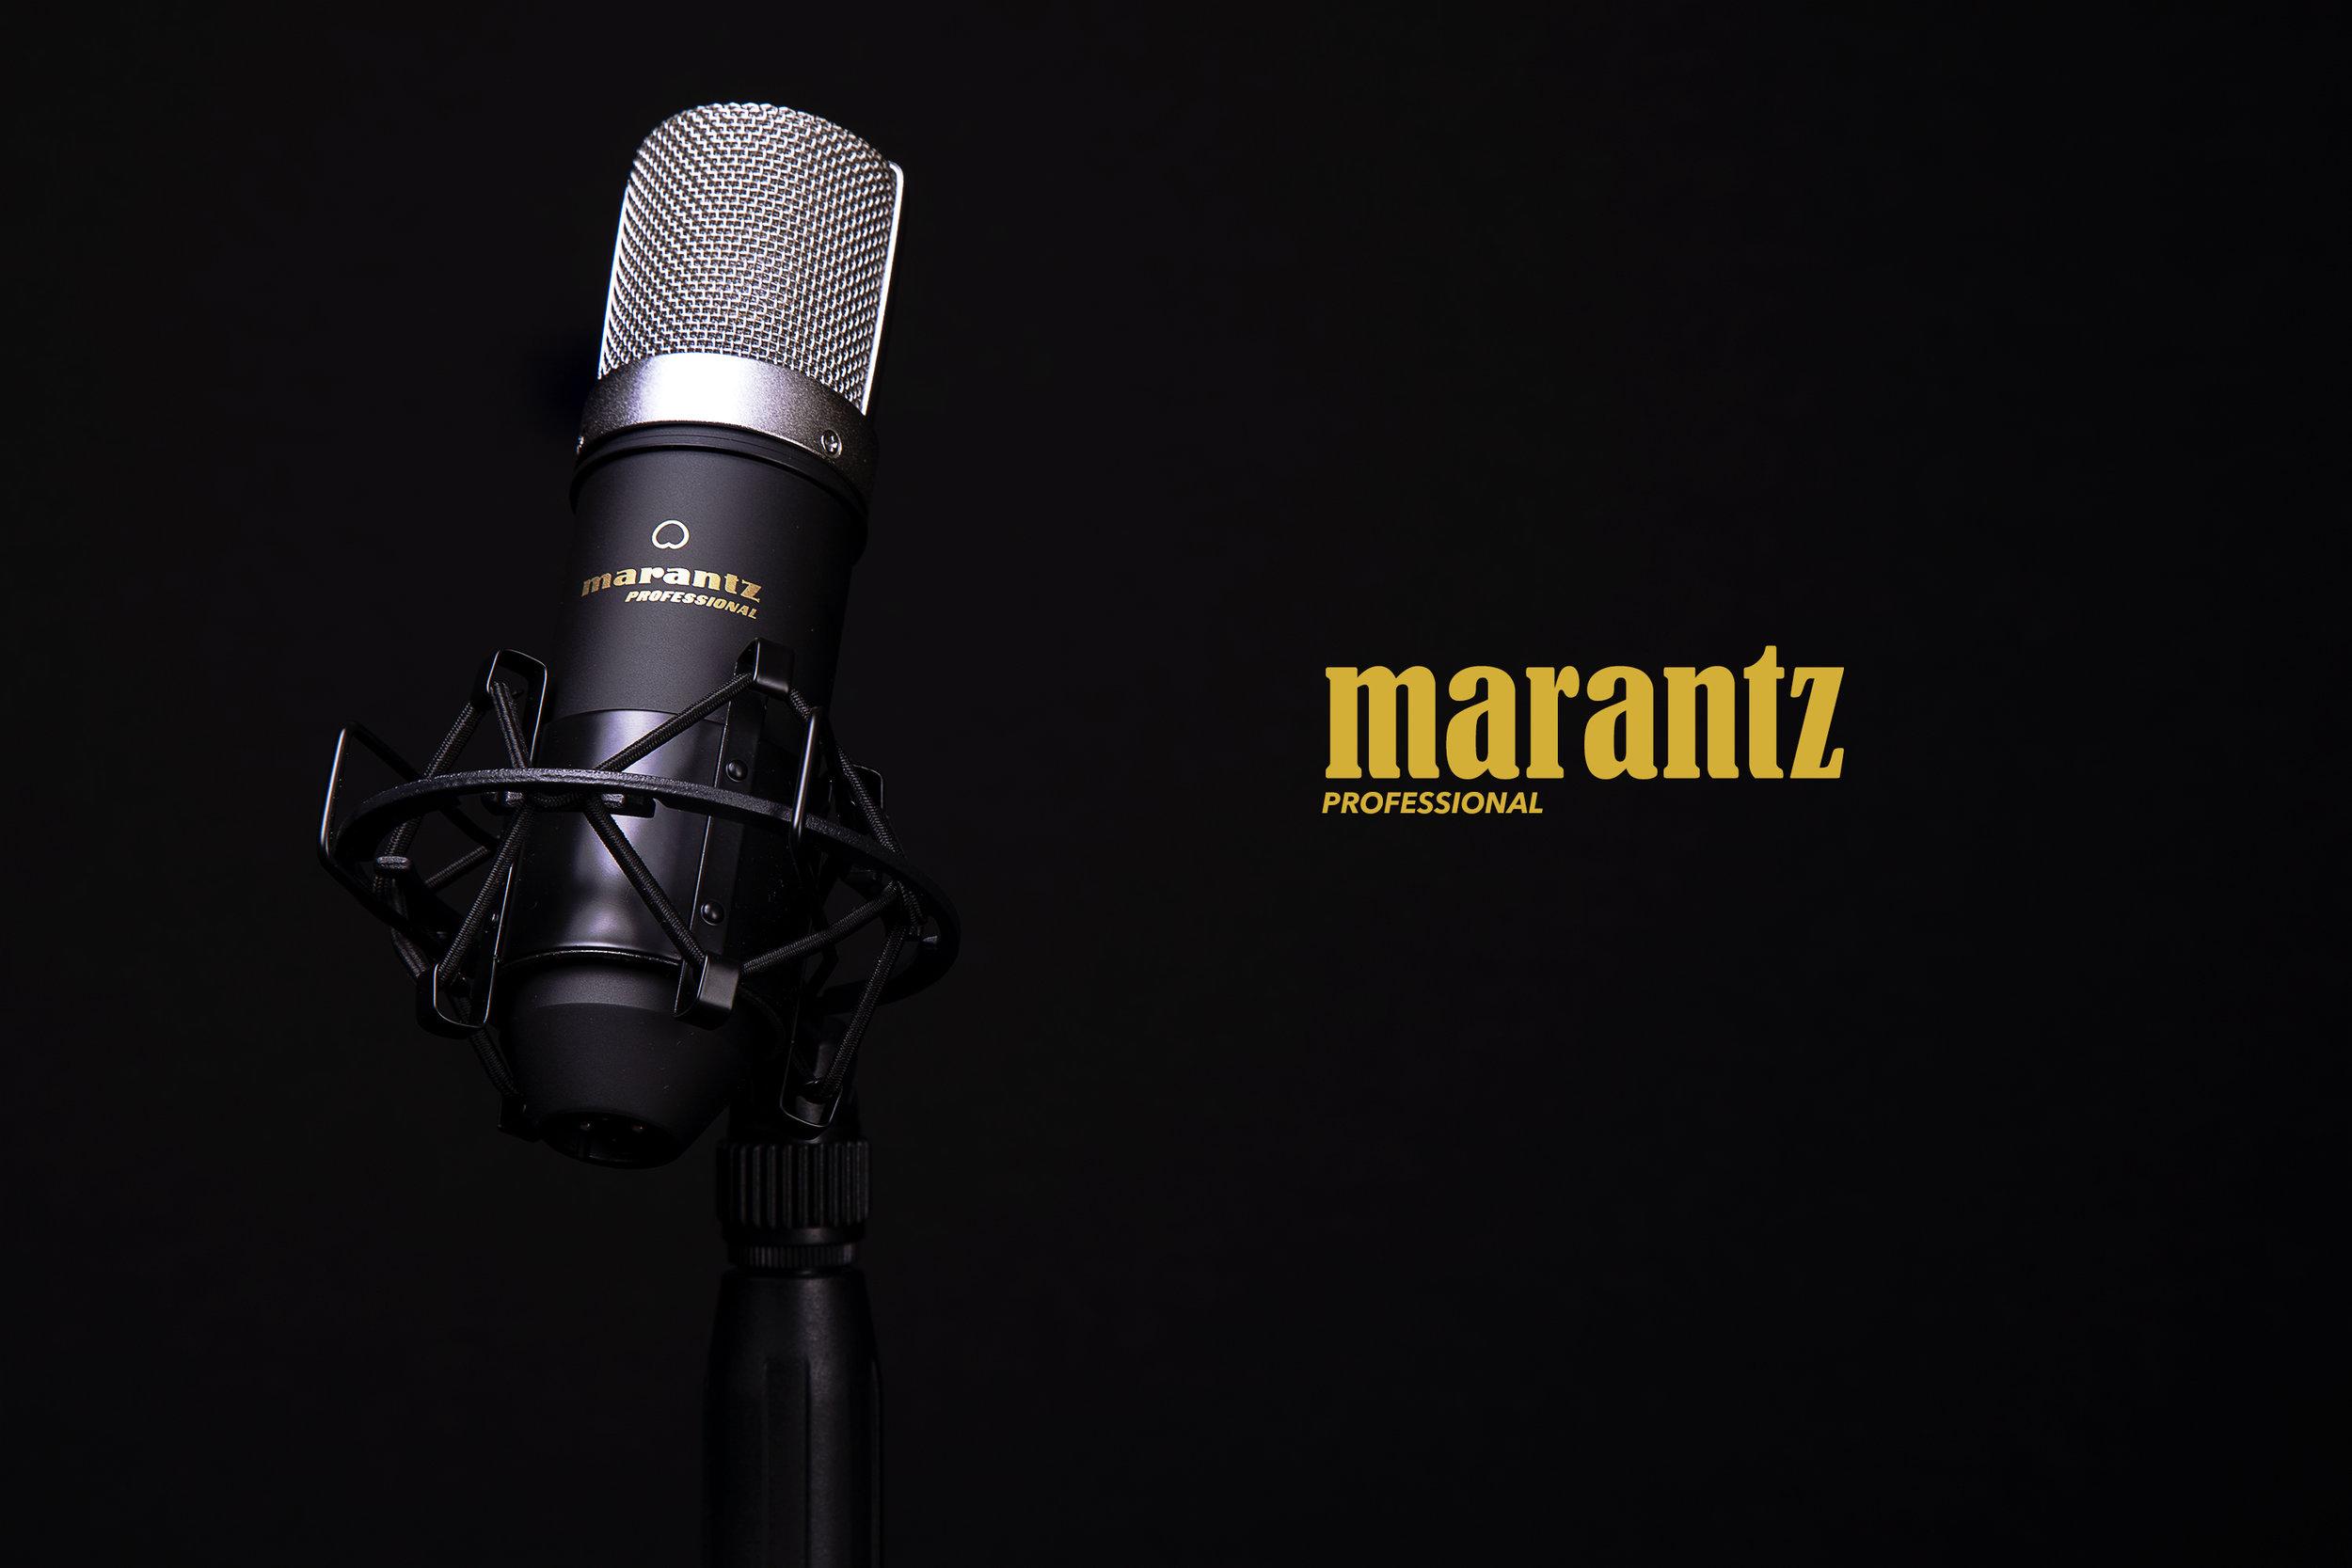 marantz mic with text wide.jpg